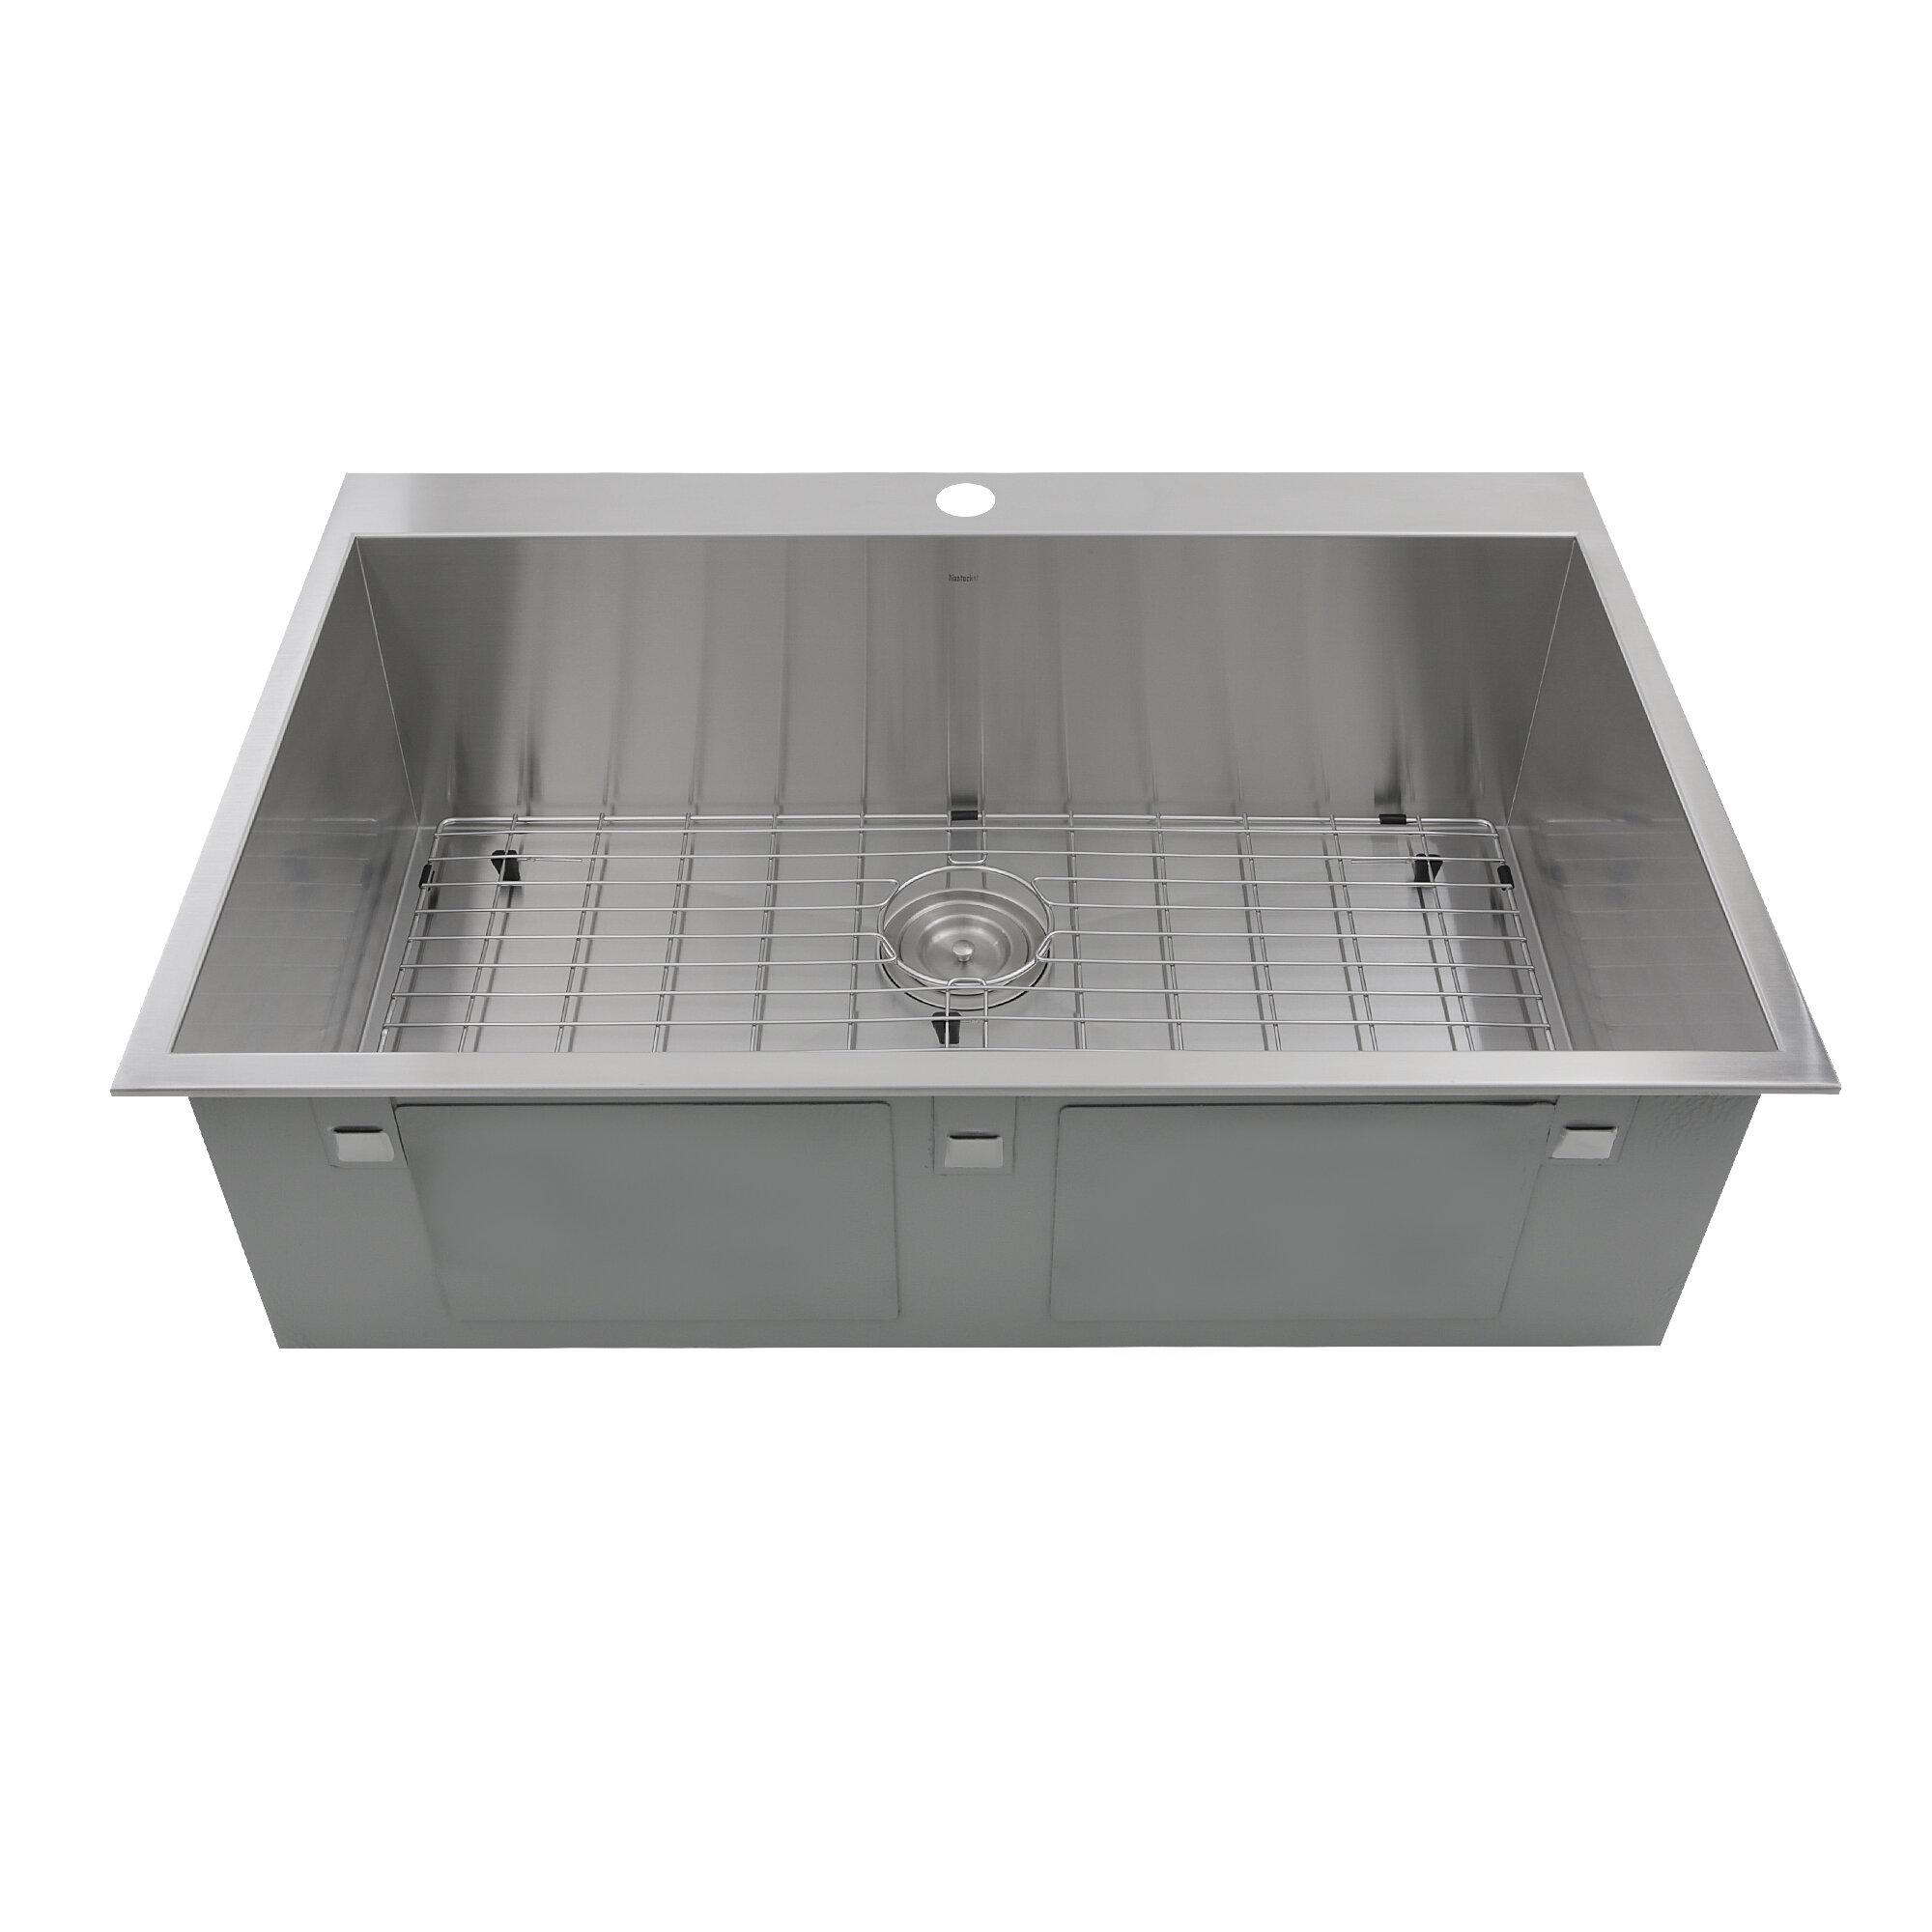 Nantucket Sinks Pro Series 33 L X 22 W Rectangle Single Hole Topmount Stainless Steel Kitchen Sink Reviews Wayfair